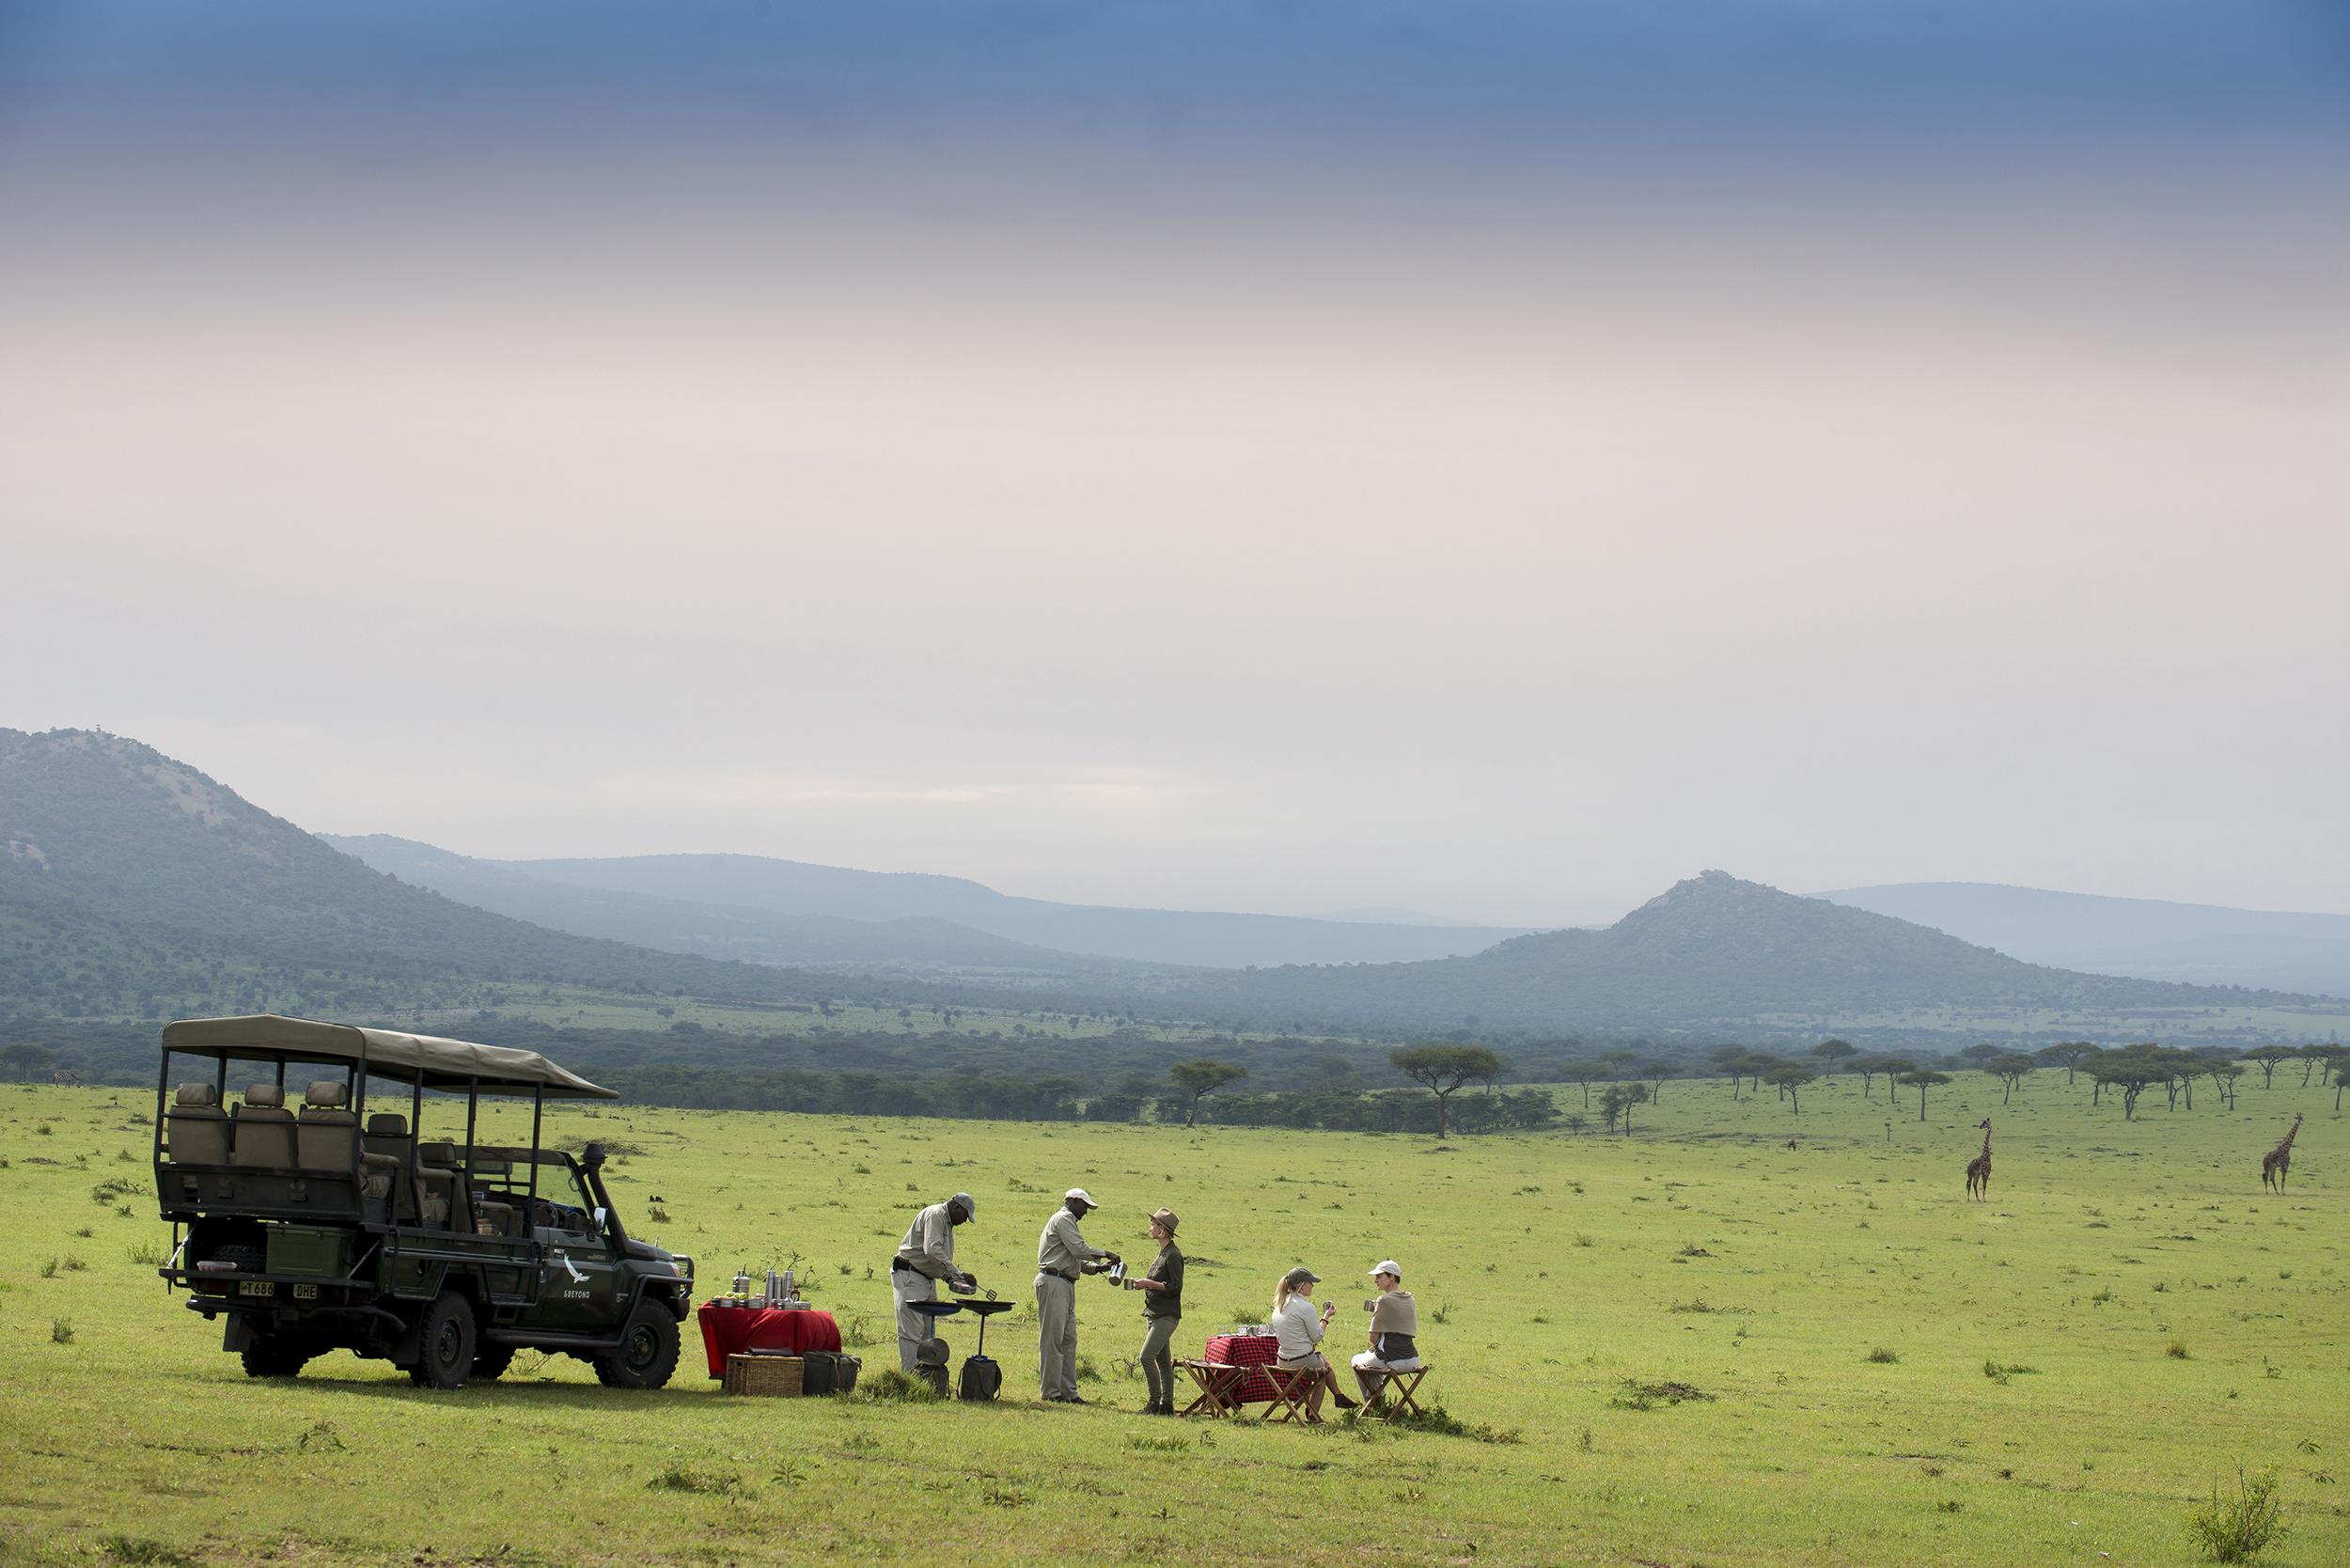 Tanzania Serengeti Kleins Camp family safari bush breakfast